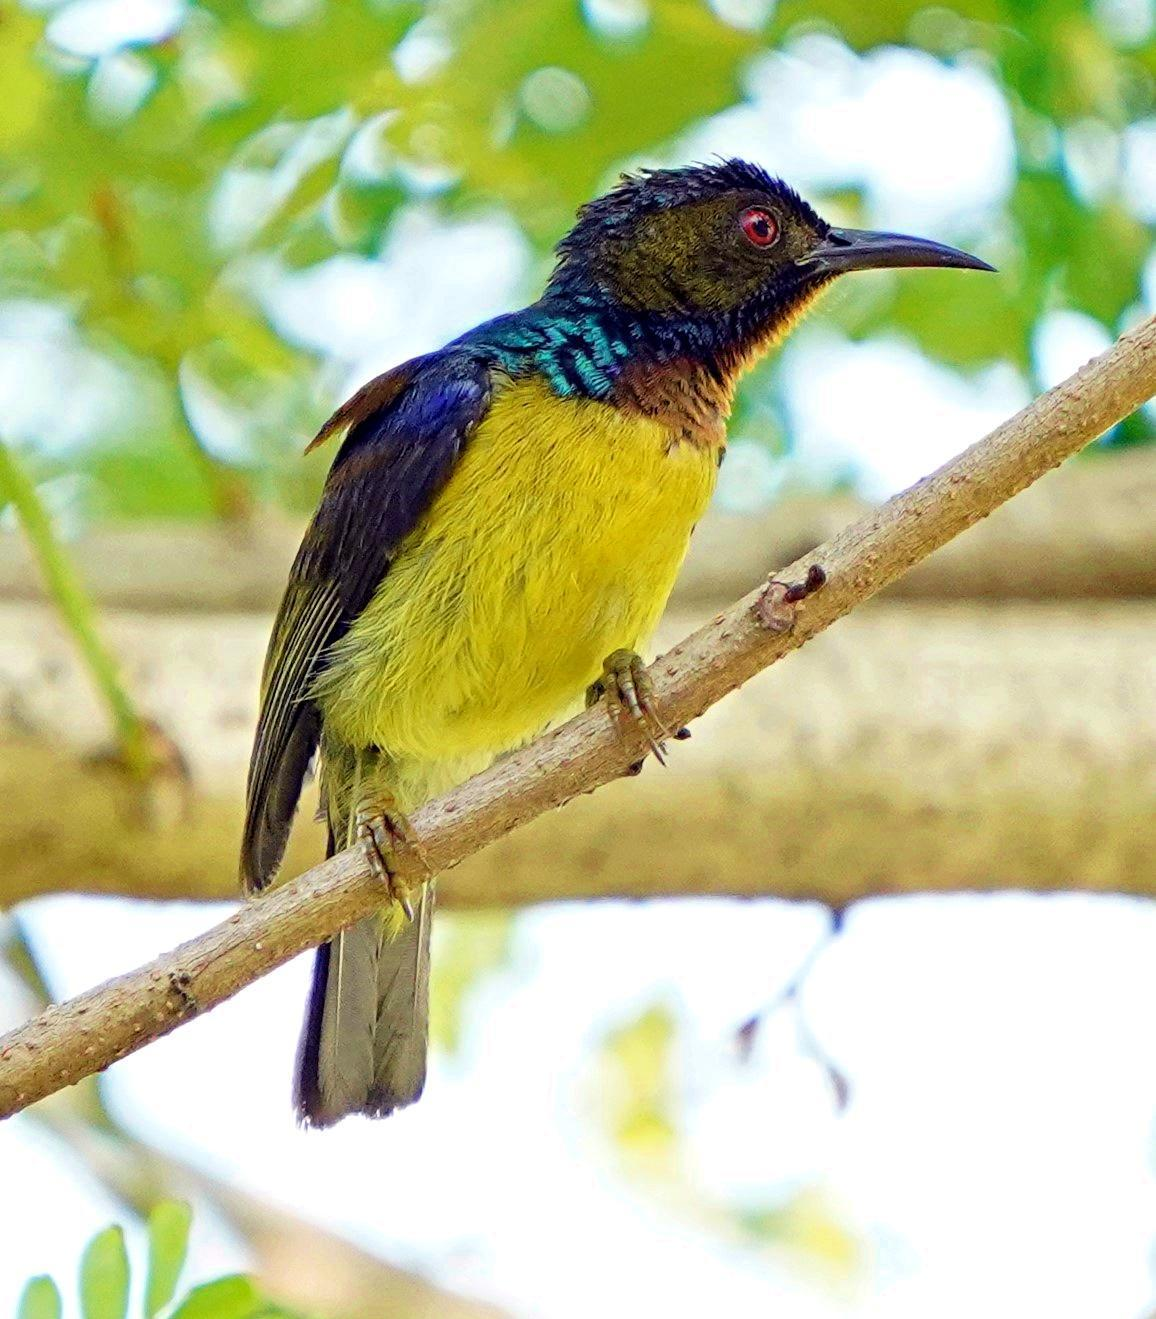 Plain-throated Sunbird Photo by Steven Cheong